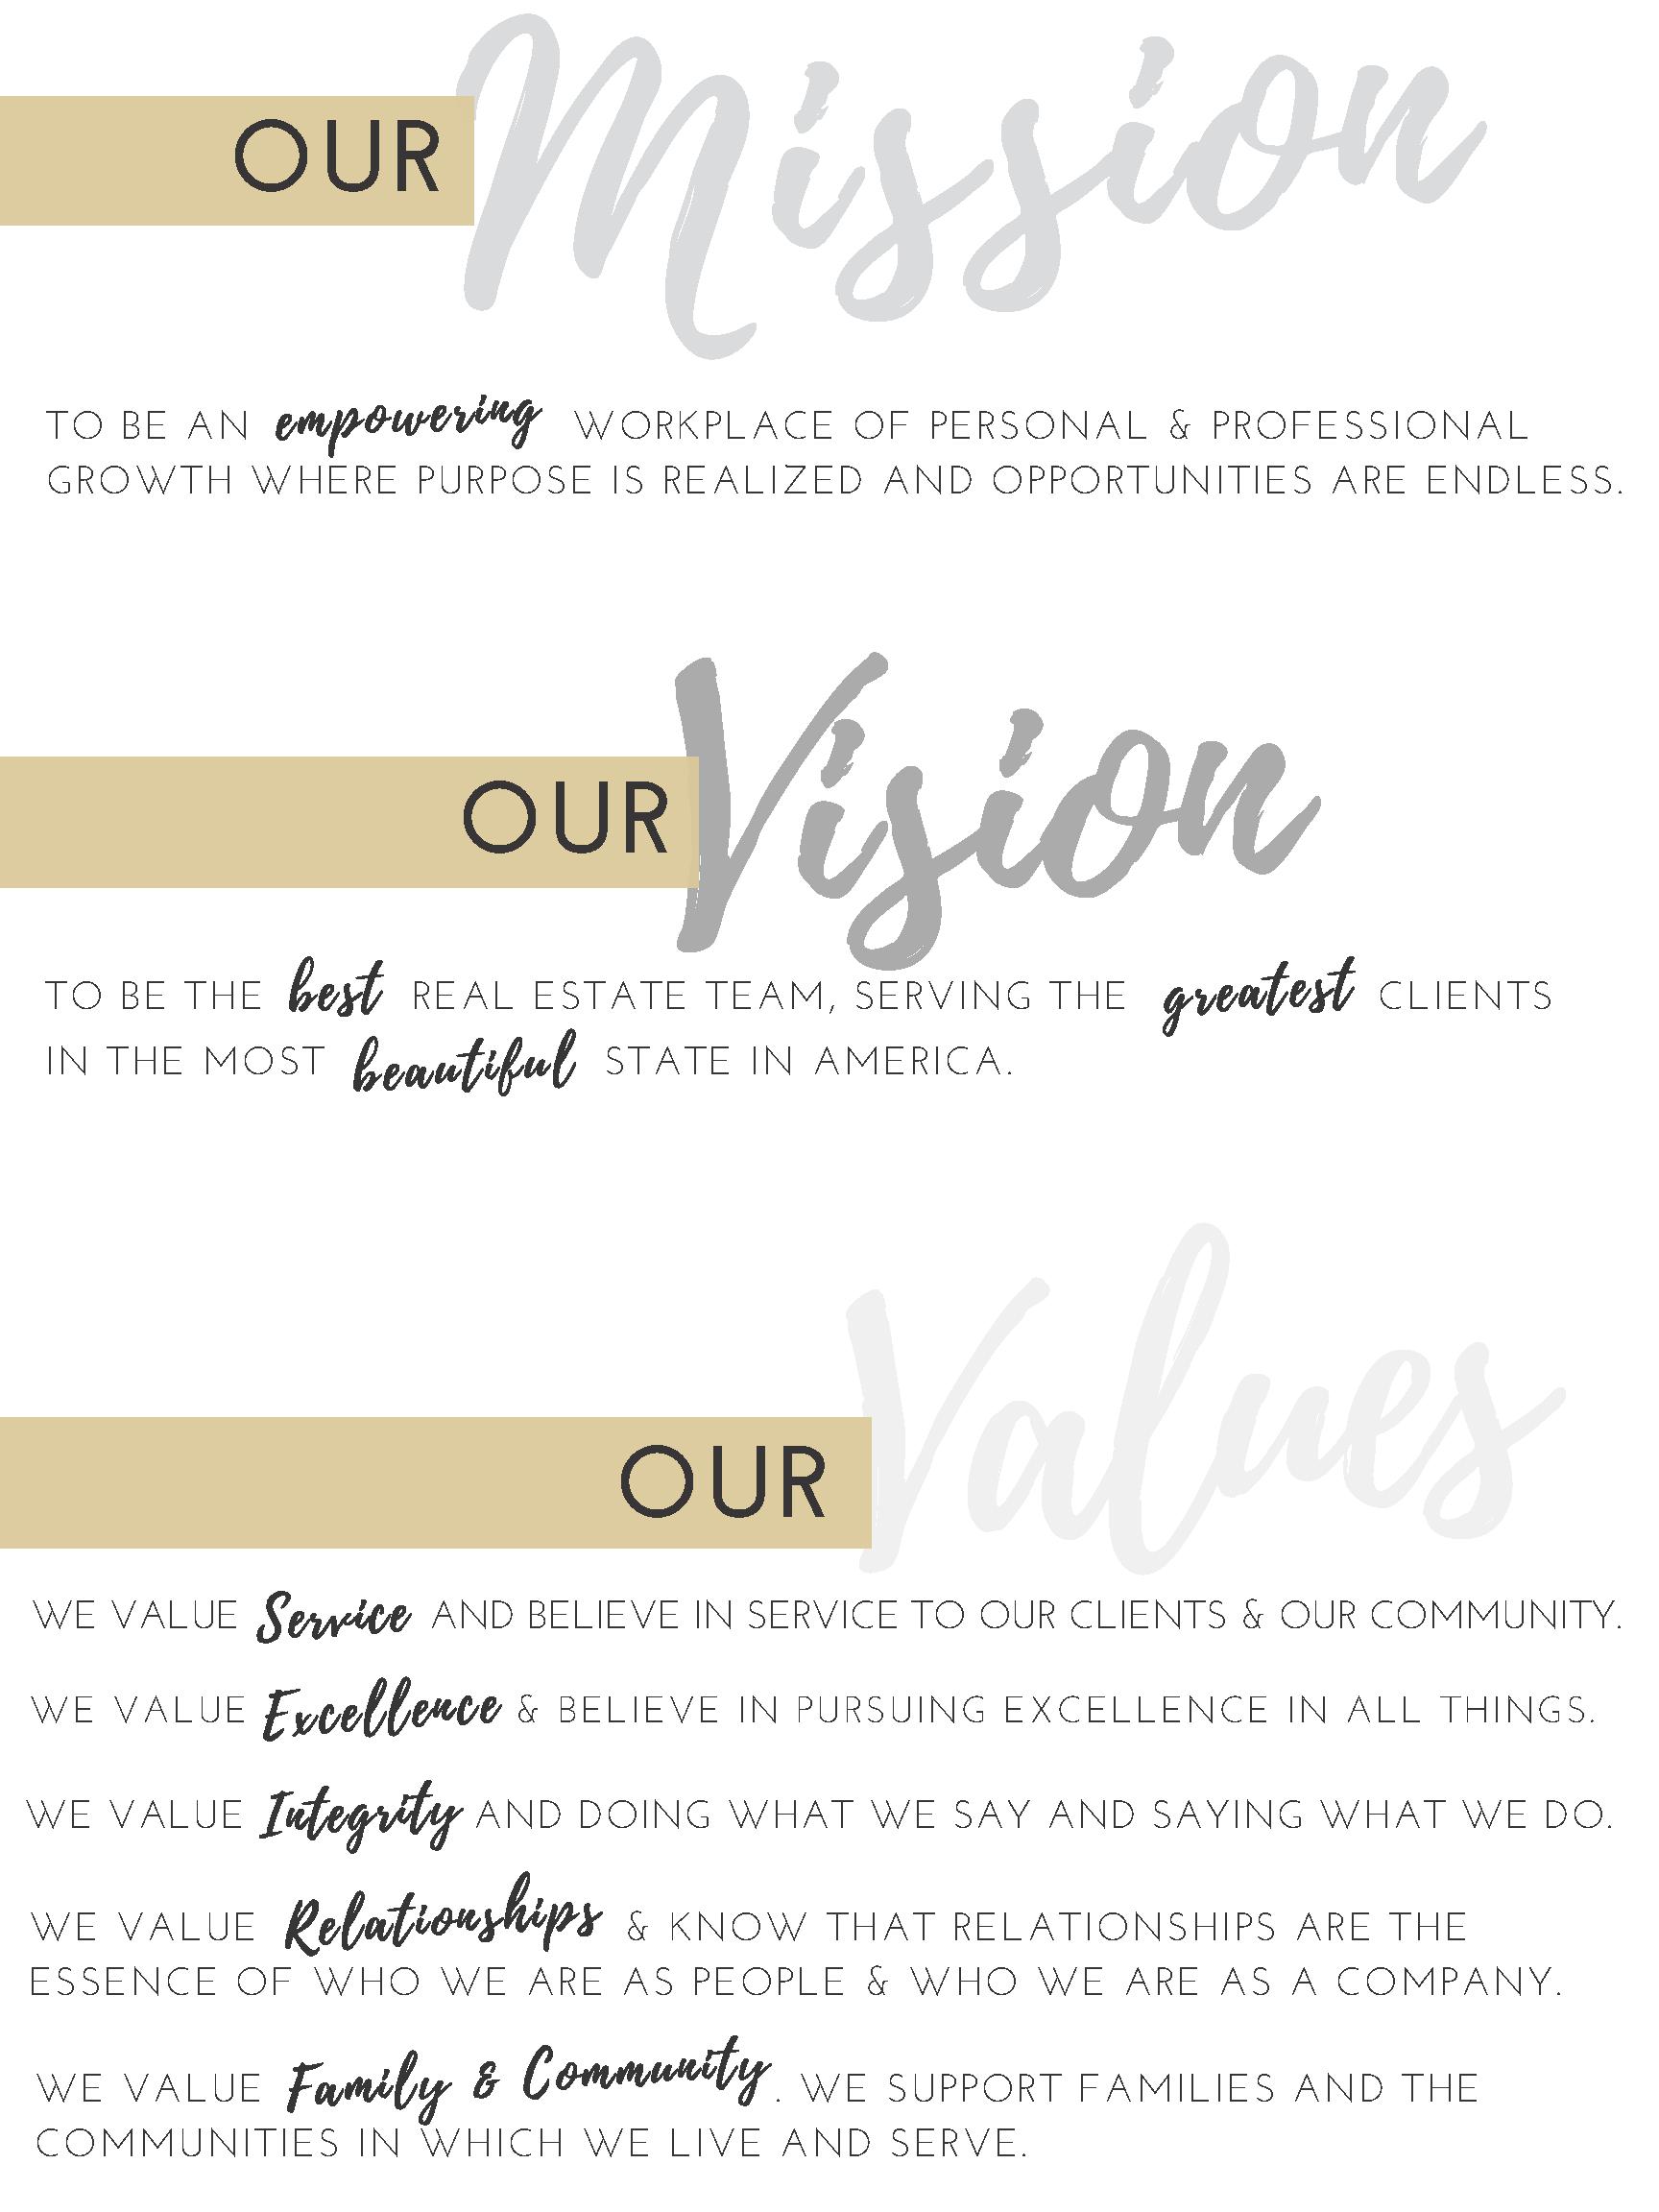 Mission, Vision & Values (2)_96 dpi.png